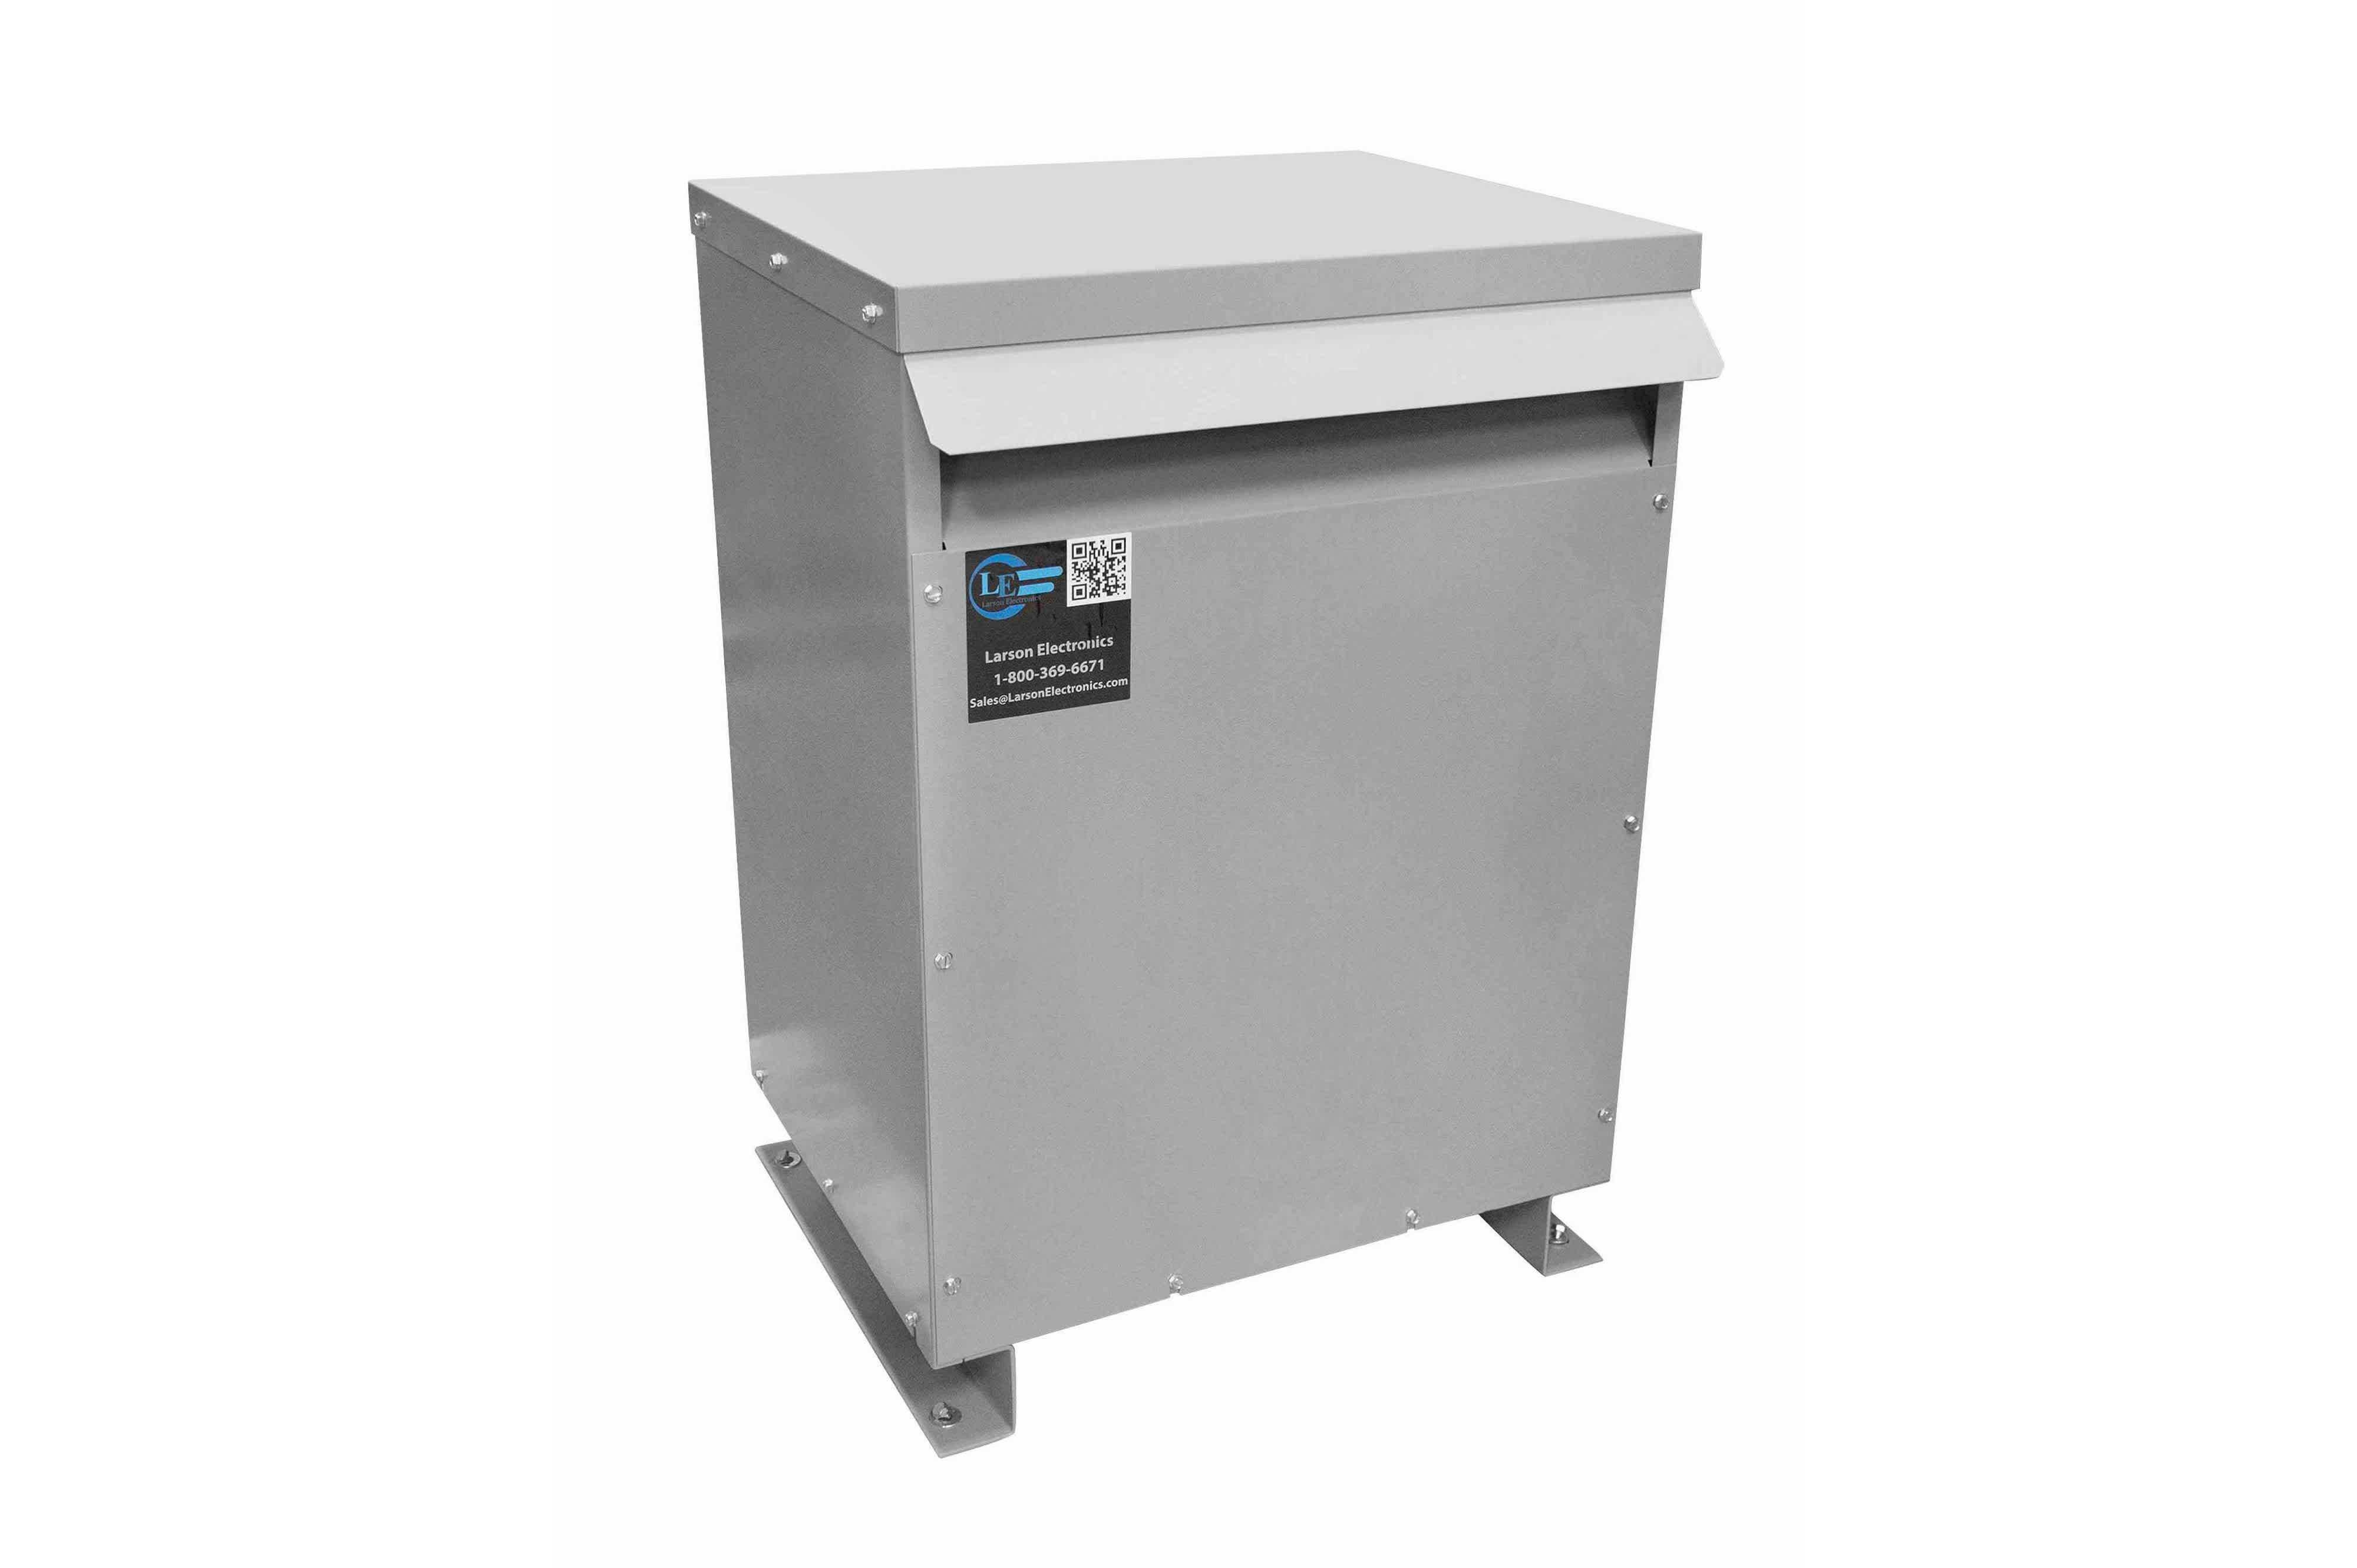 37.5 kVA 3PH DOE Transformer, 480V Delta Primary, 480Y/277 Wye-N Secondary, N3R, Ventilated, 60 Hz